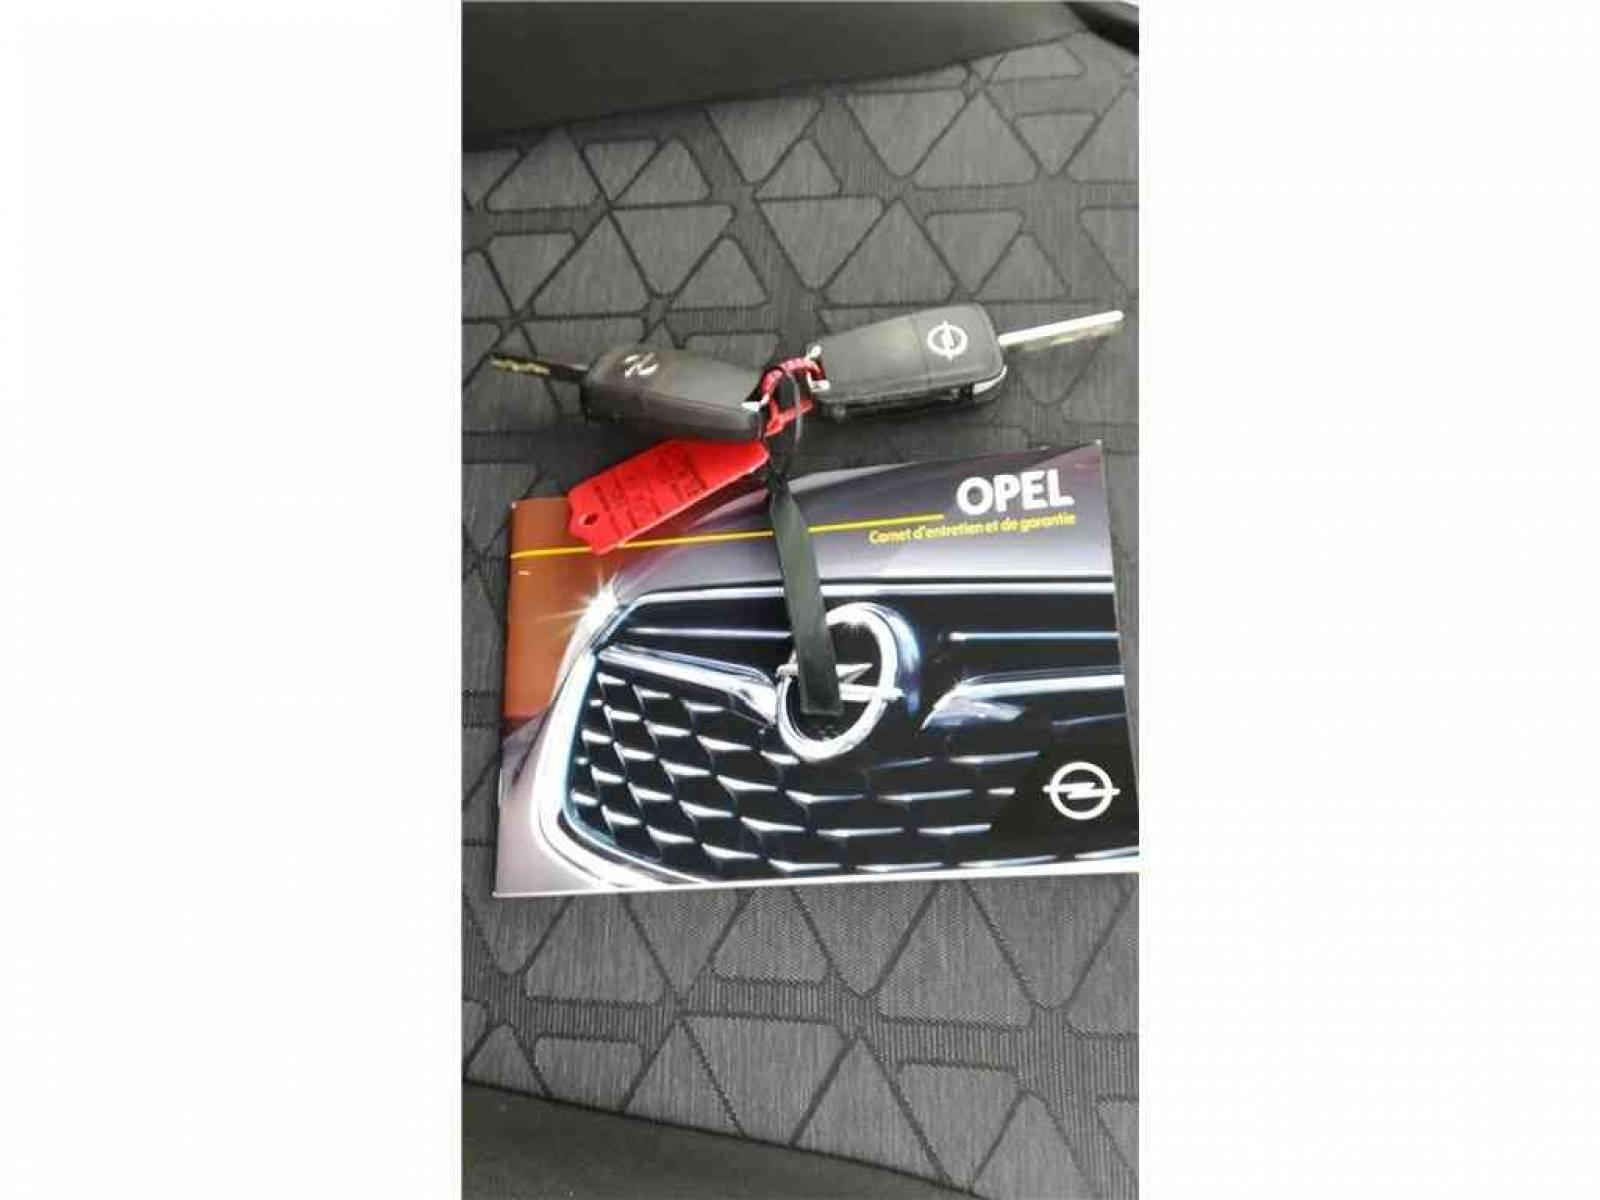 OPEL Corsa 1.4 Turbo 100 ch - véhicule d'occasion - Groupe Guillet - Opel Magicauto - Chalon-sur-Saône - 71380 - Saint-Marcel - 25